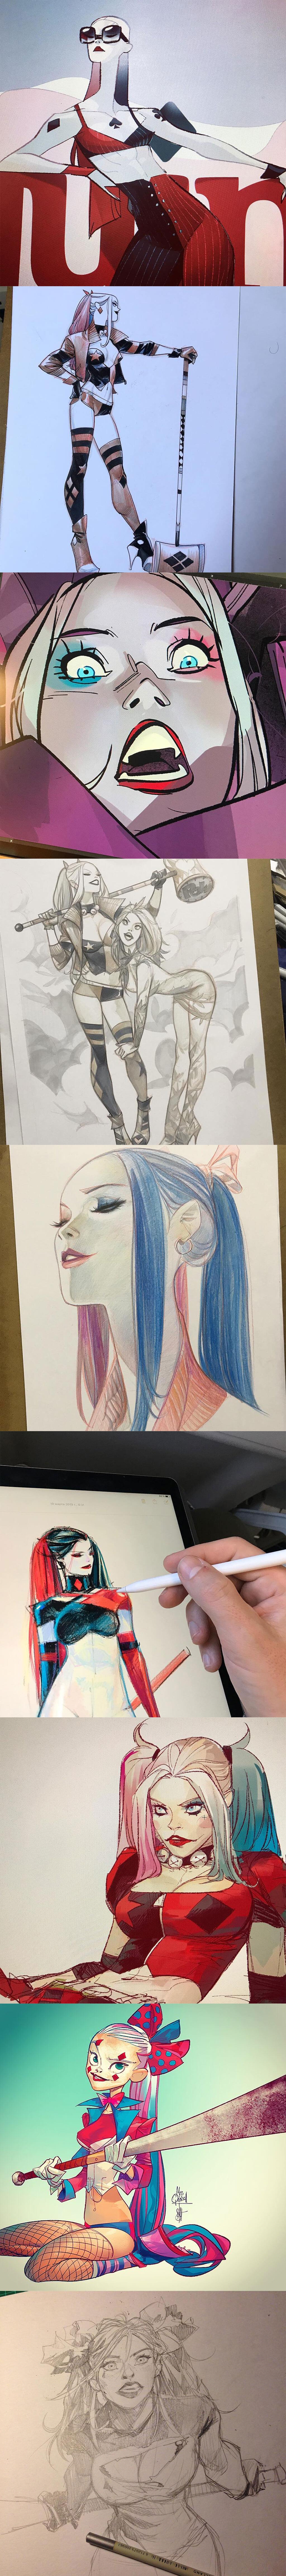 Harley Quinn Fanart by Евгений Шмидт